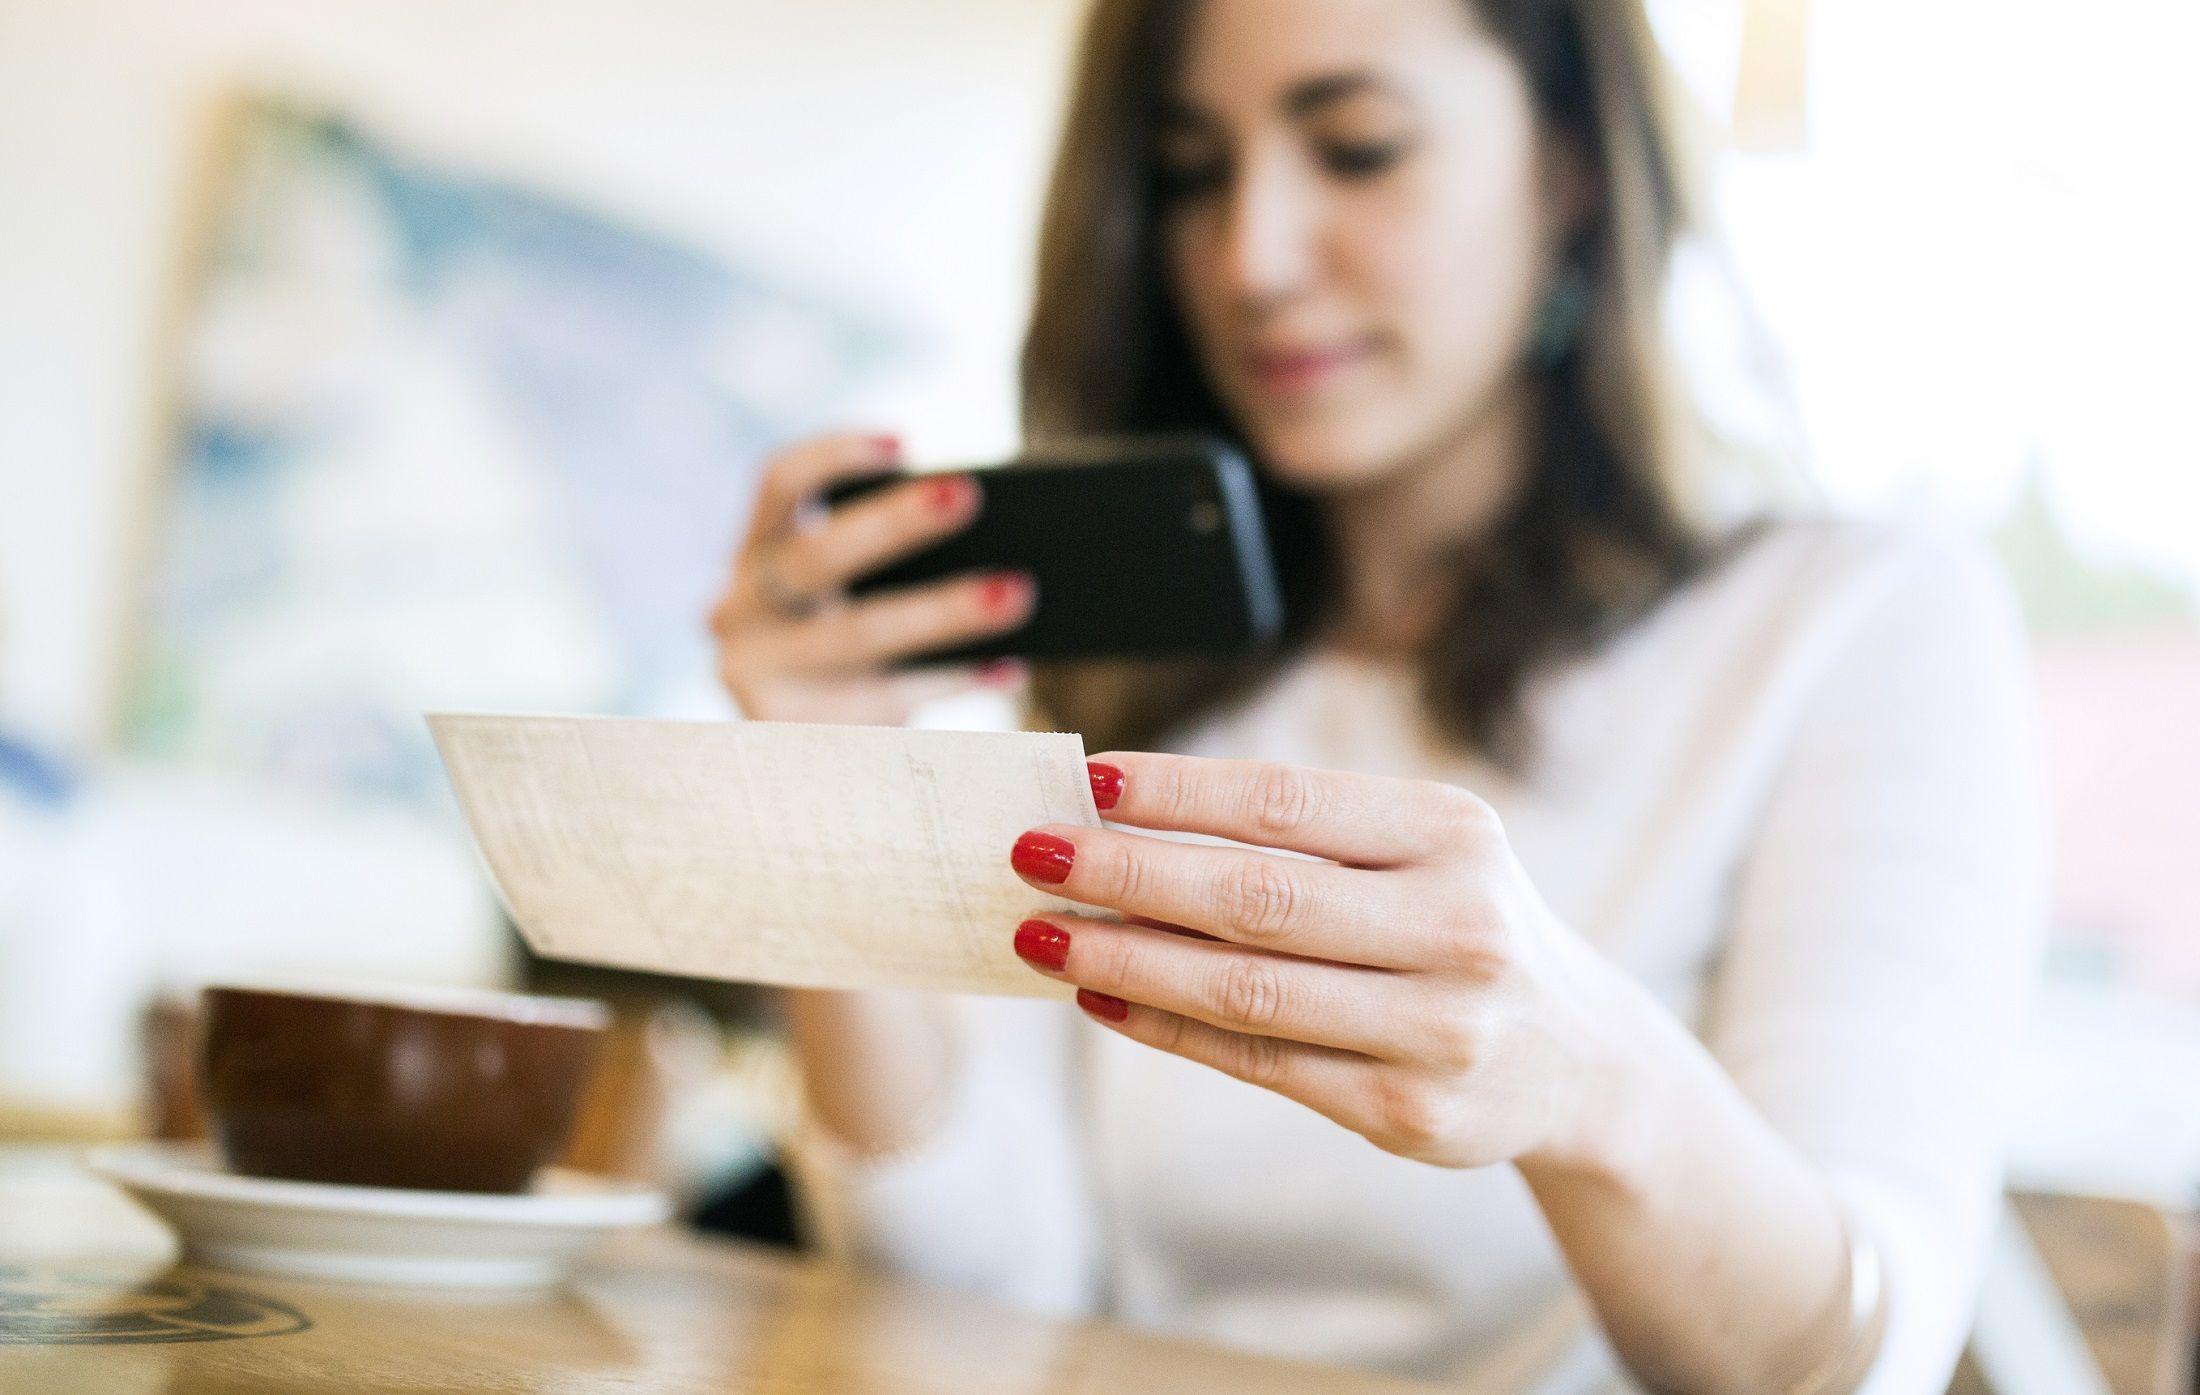 millennials banking habits